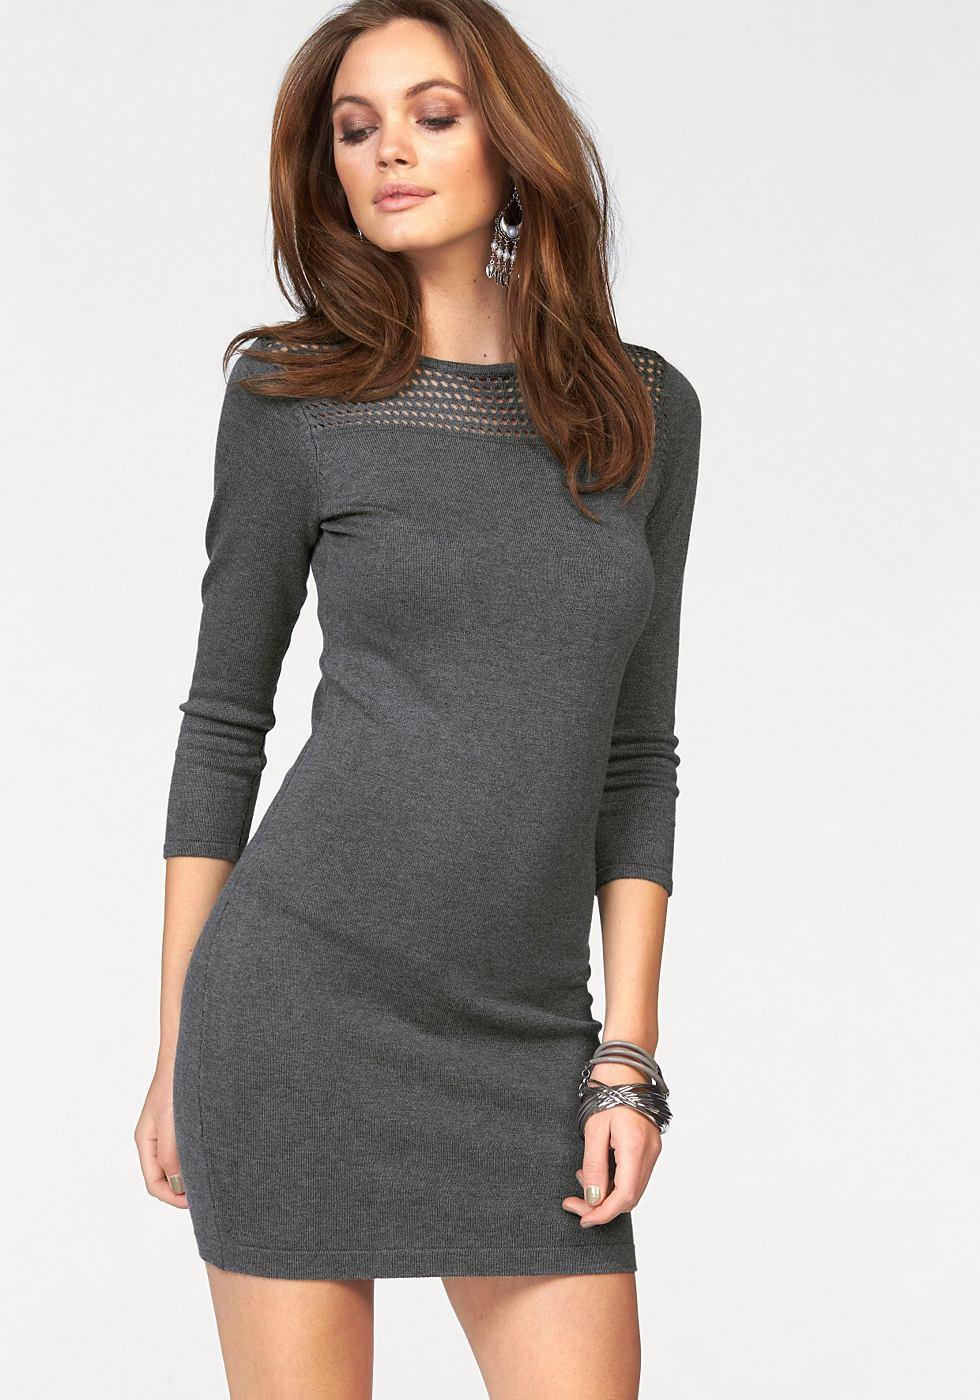 Melrose Tricot-jurk met ronde hals grijs